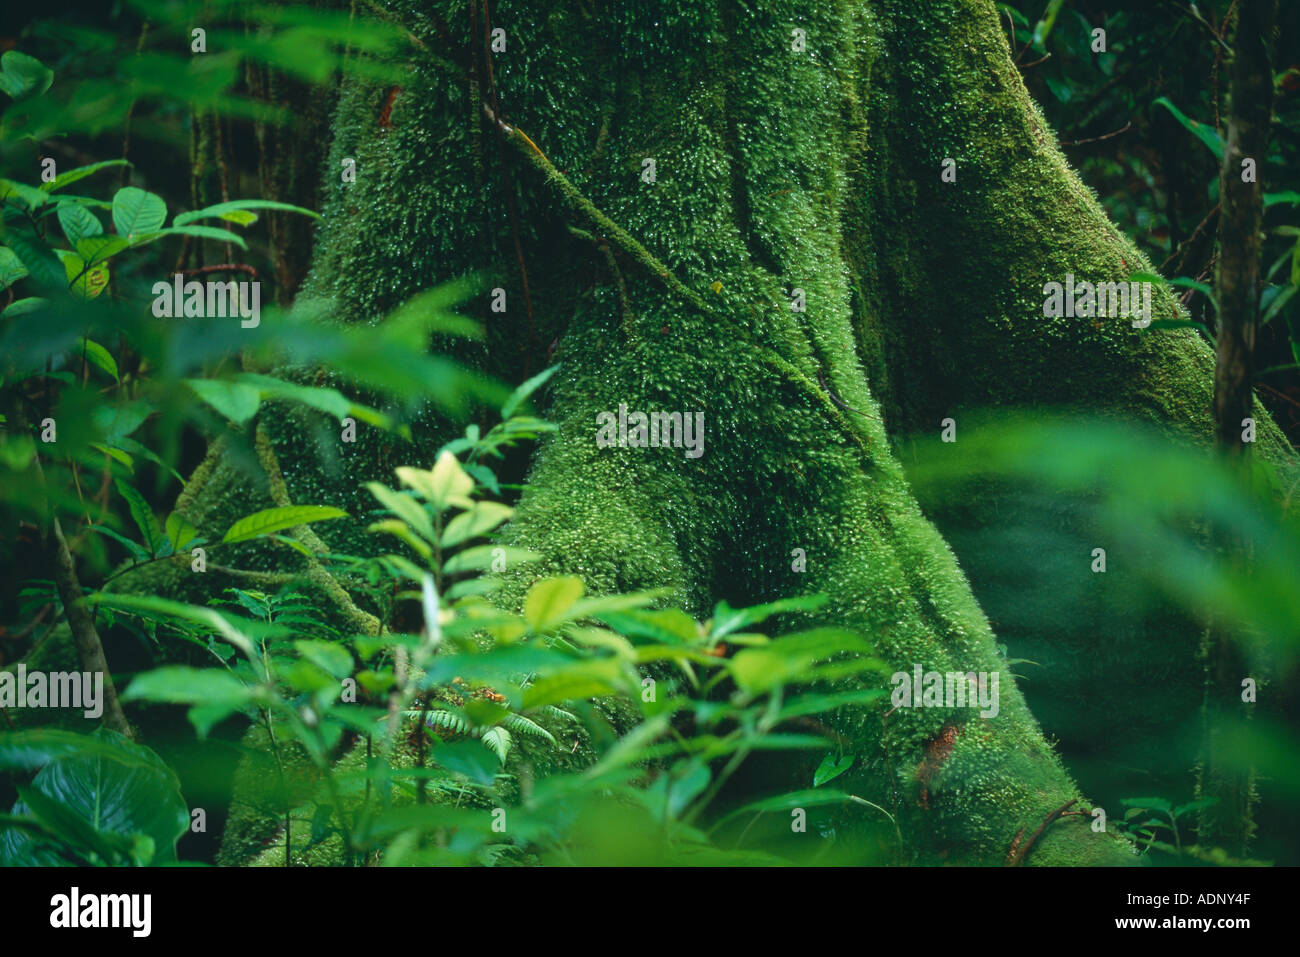 Les racines des arbres moussus des forêts tropicales nr La Fortuna Zona Norte Costa Rica Photo Stock